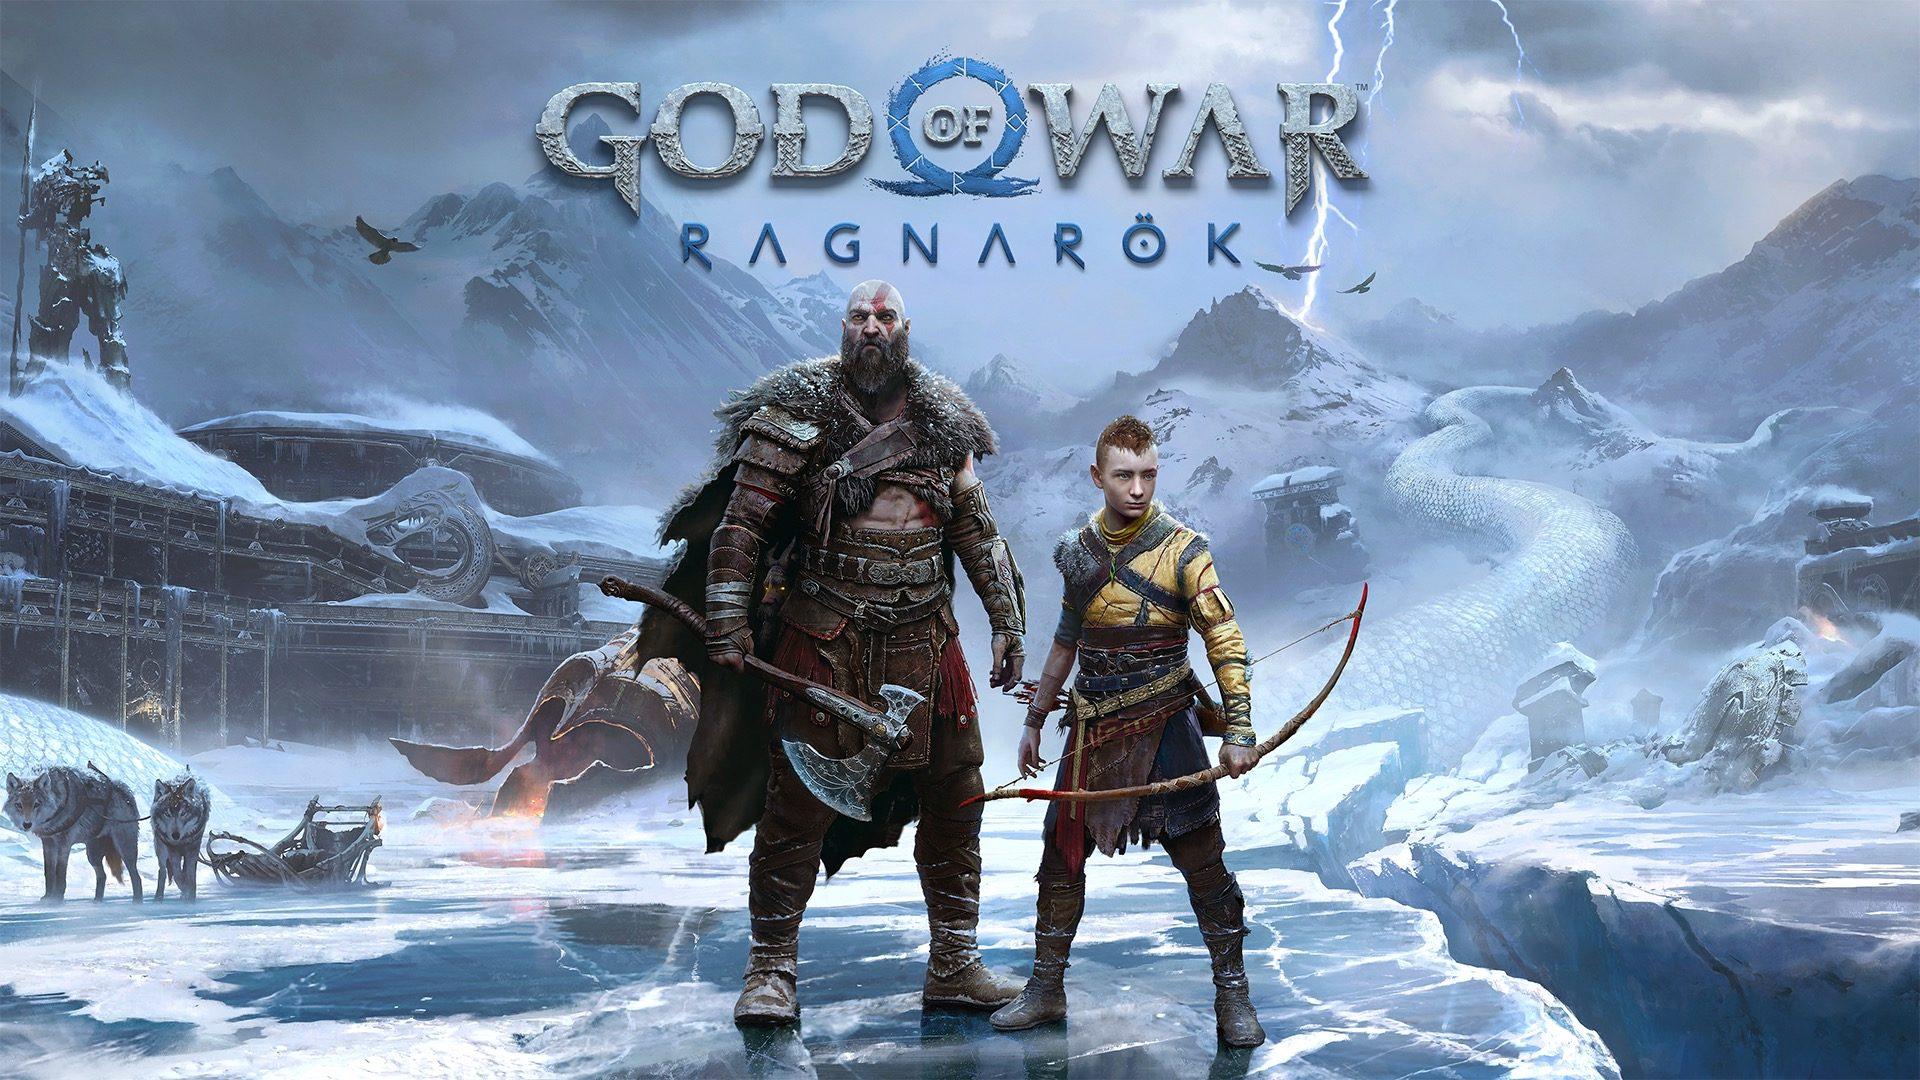 First look at God of War Ragnarök – PlayStation.Blog - Tech News